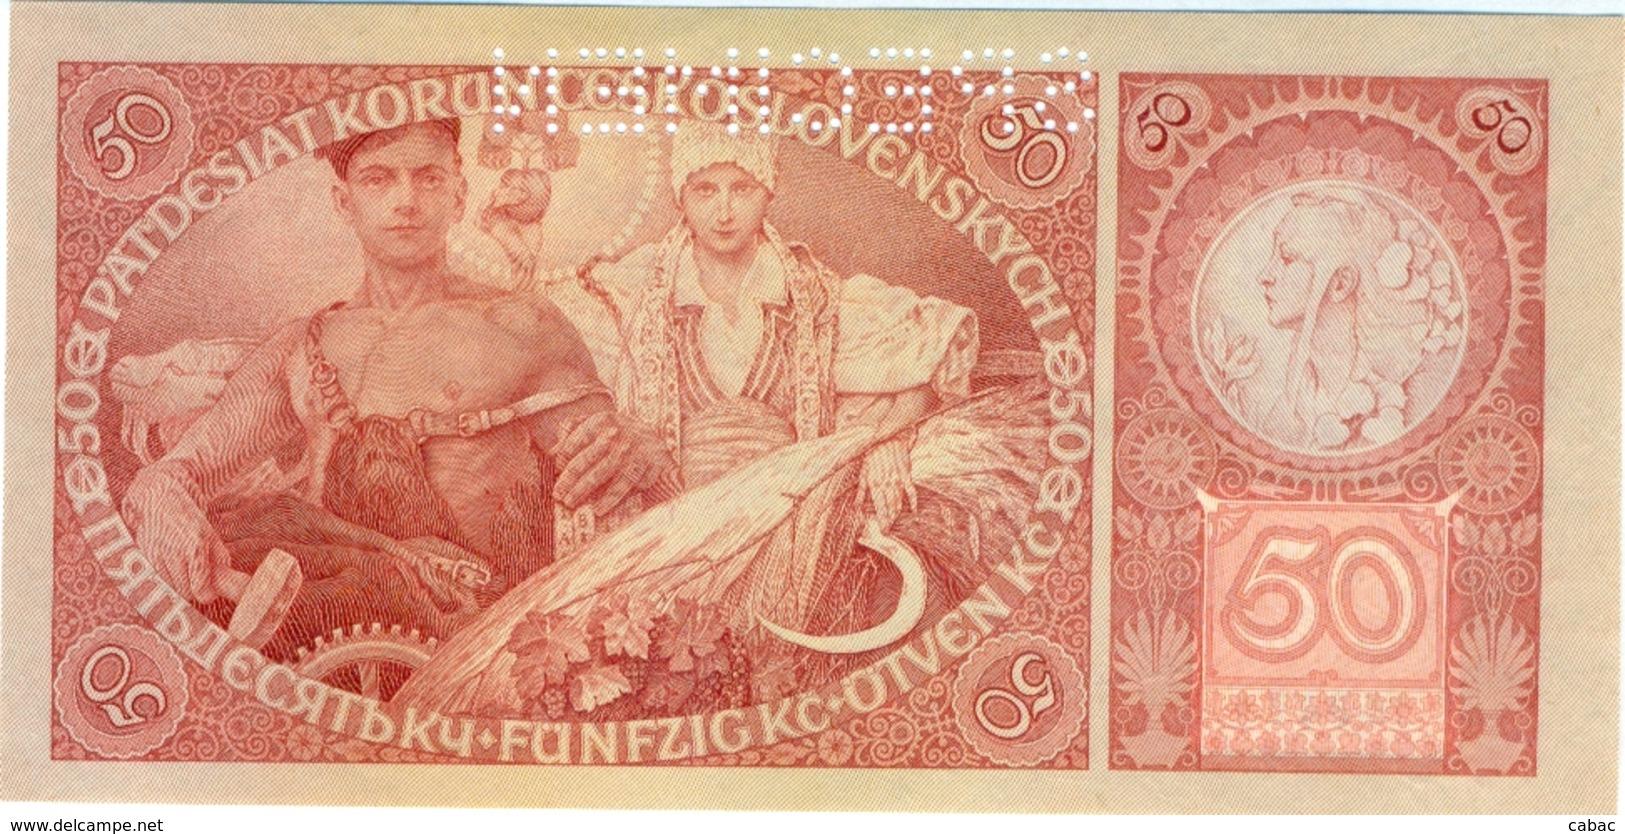 Czechoslovakia, 50 Korun, 1929, SPECIMEN,  Narodna Banka Češkoslovenska, Patdesiat Korun, Kronen, Pravda Vitezi, čislo - Tchécoslovaquie